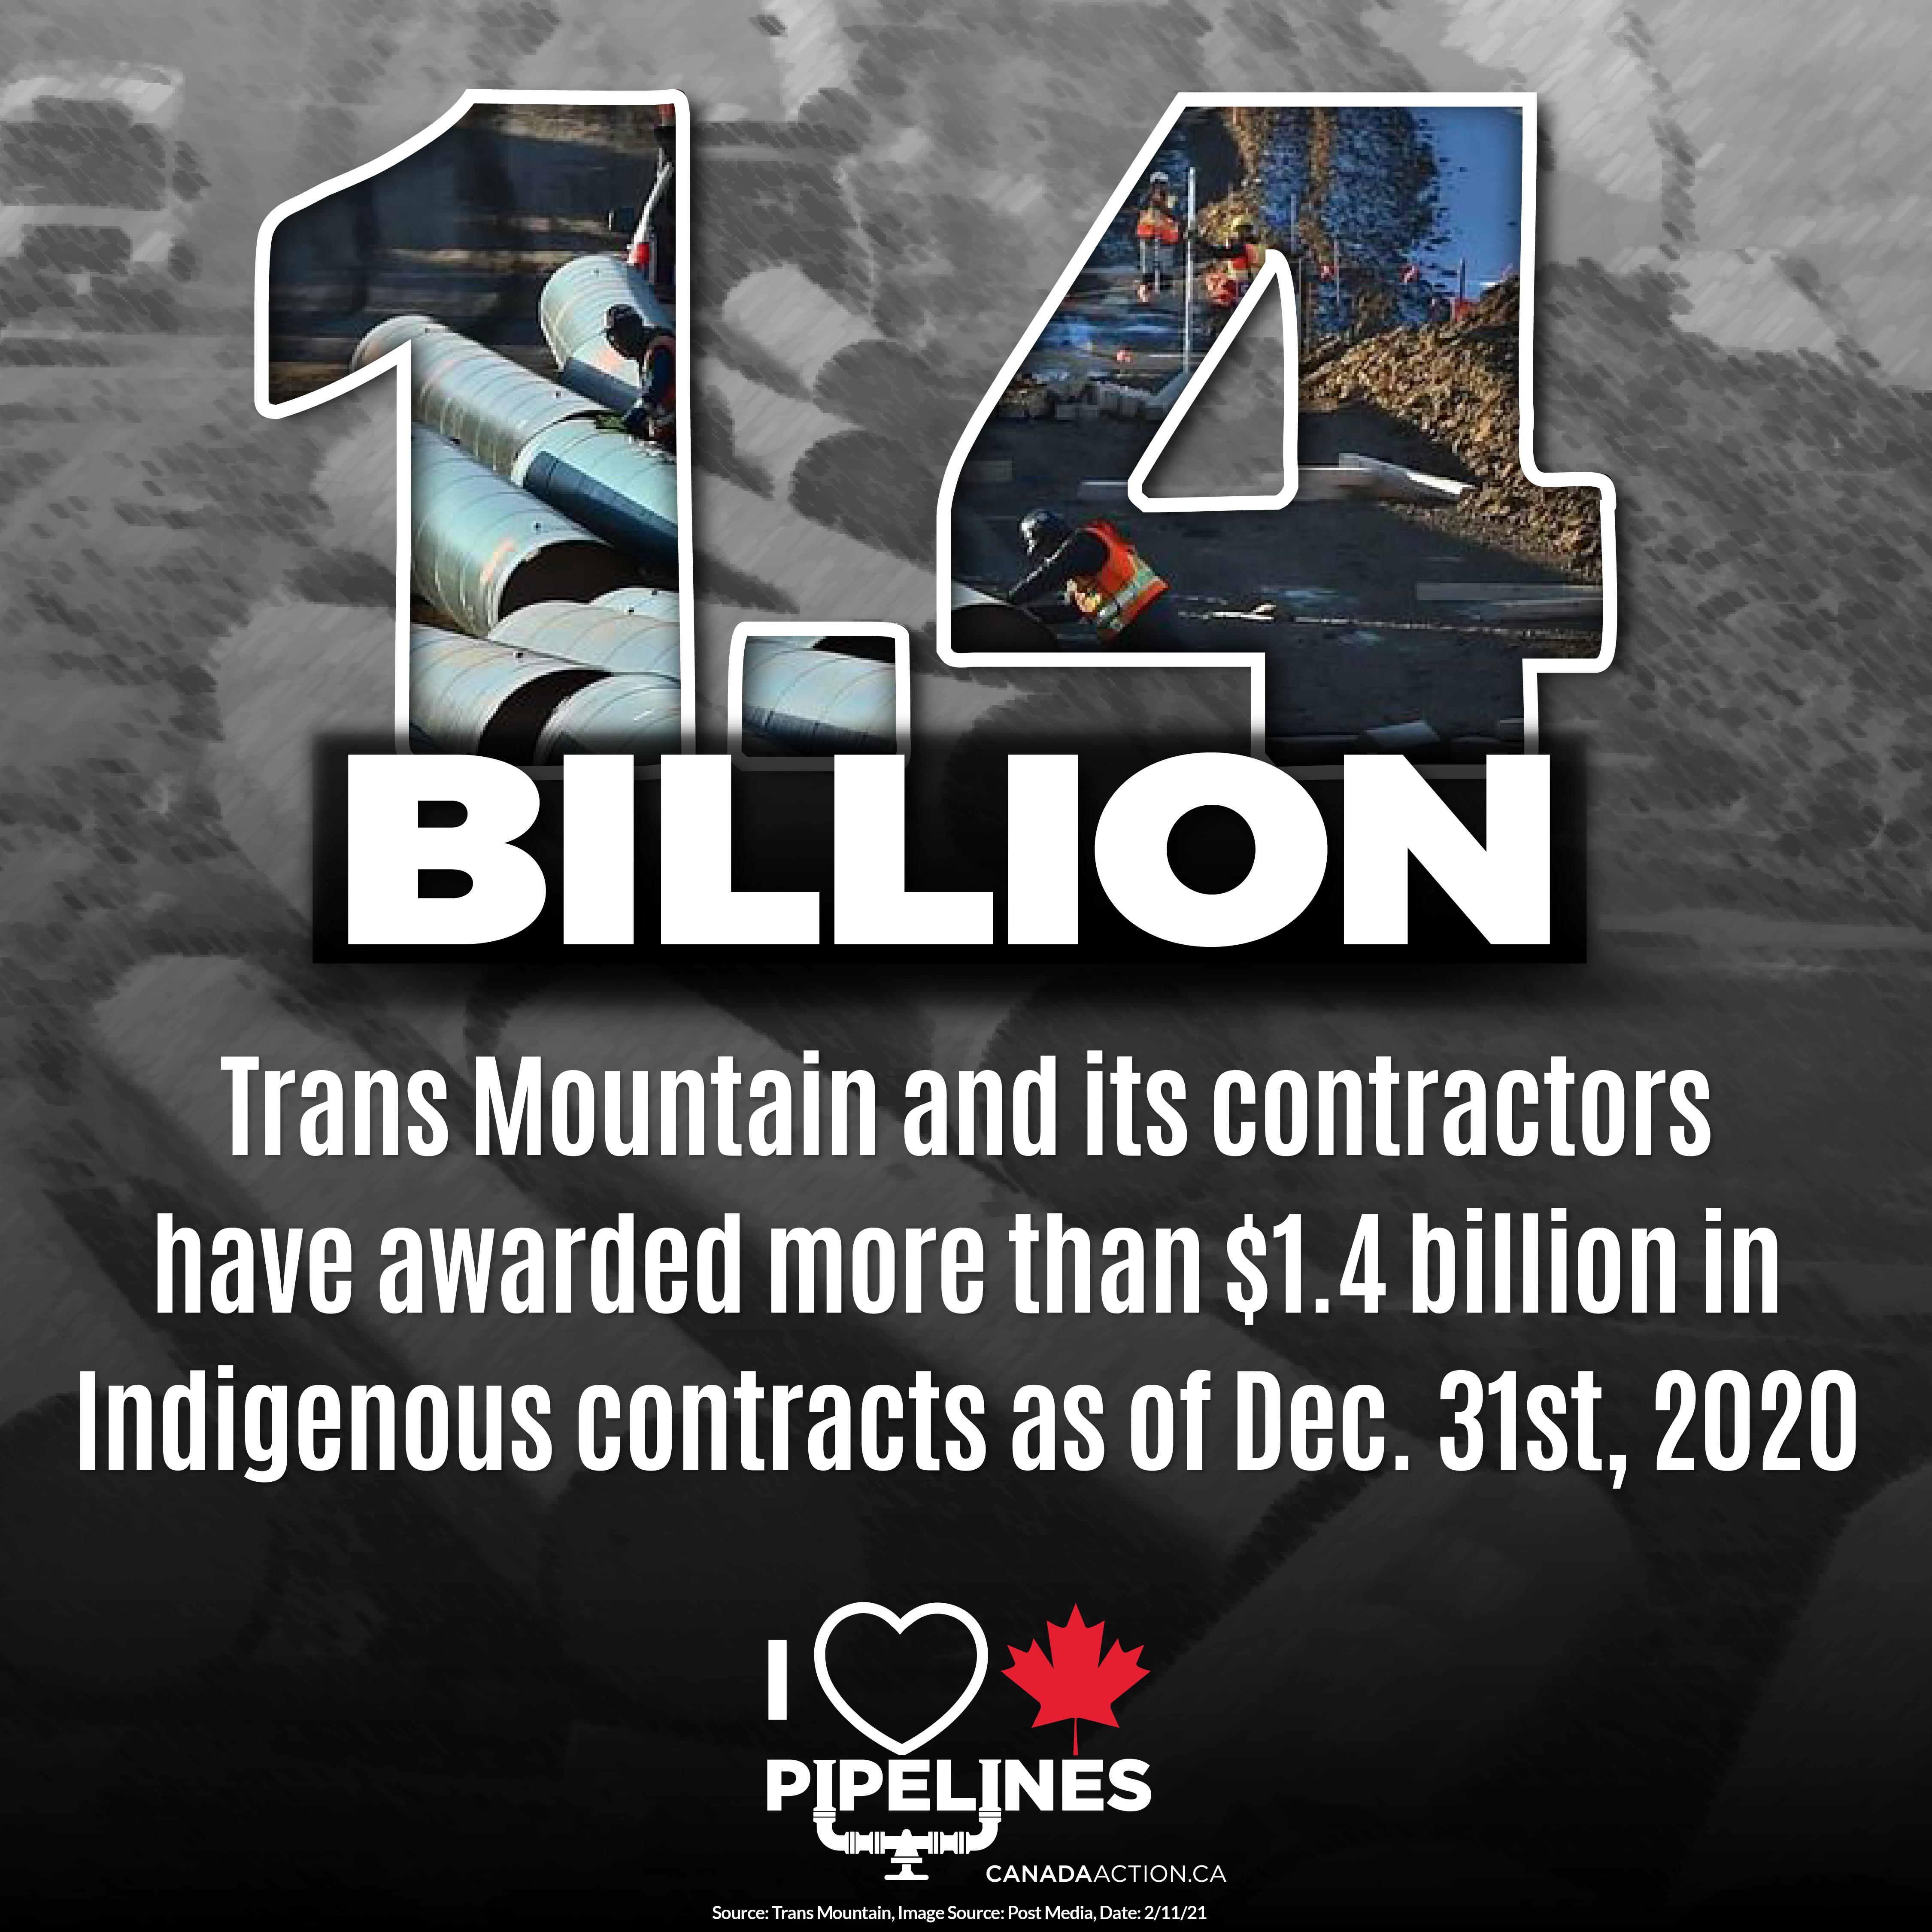 Trans Mountain Pipeline Indigenous Spend Dec 31st, 2020